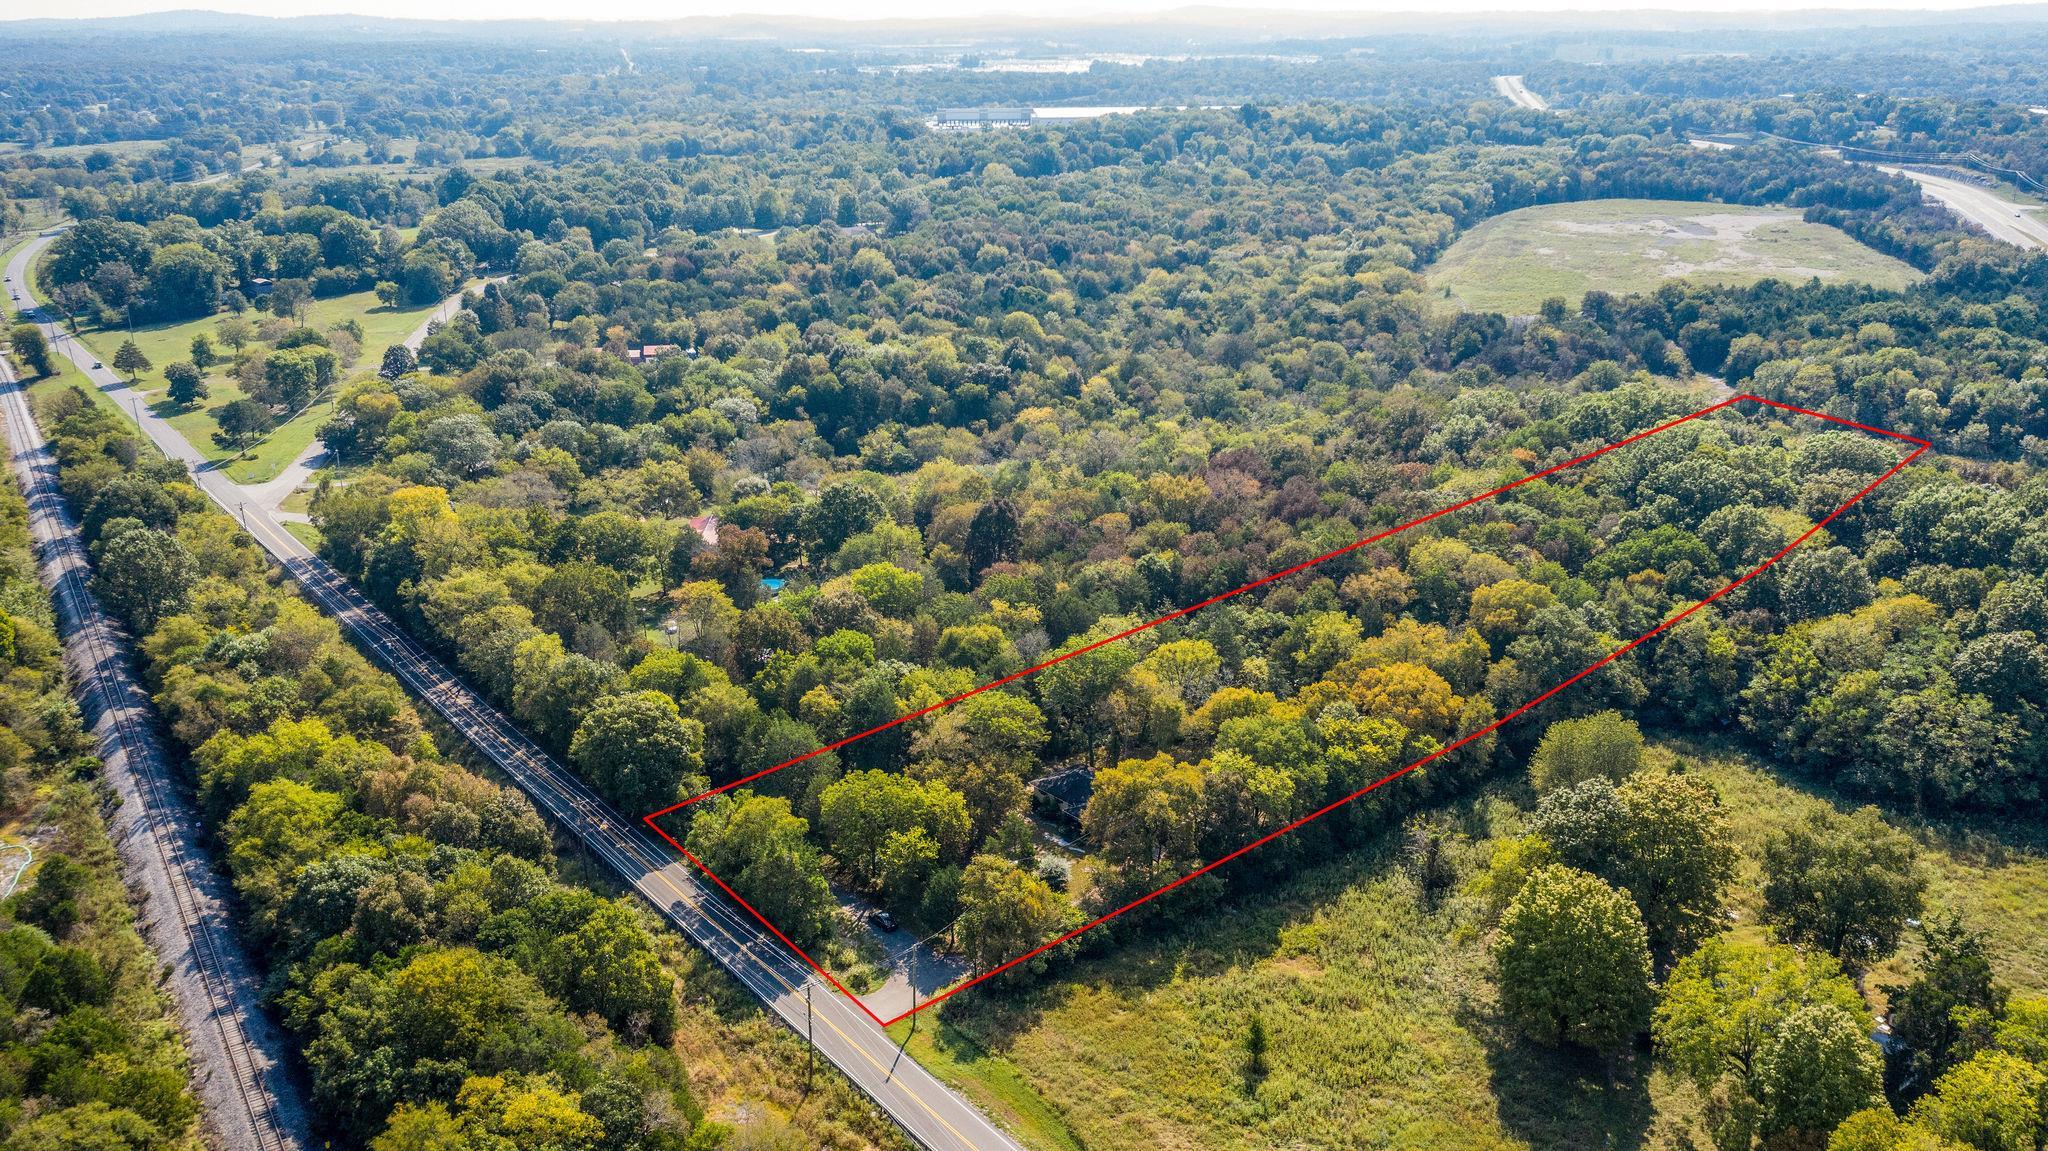 2530A E Division St, Mount Juliet, TN 37122 - Mount Juliet, TN real estate listing